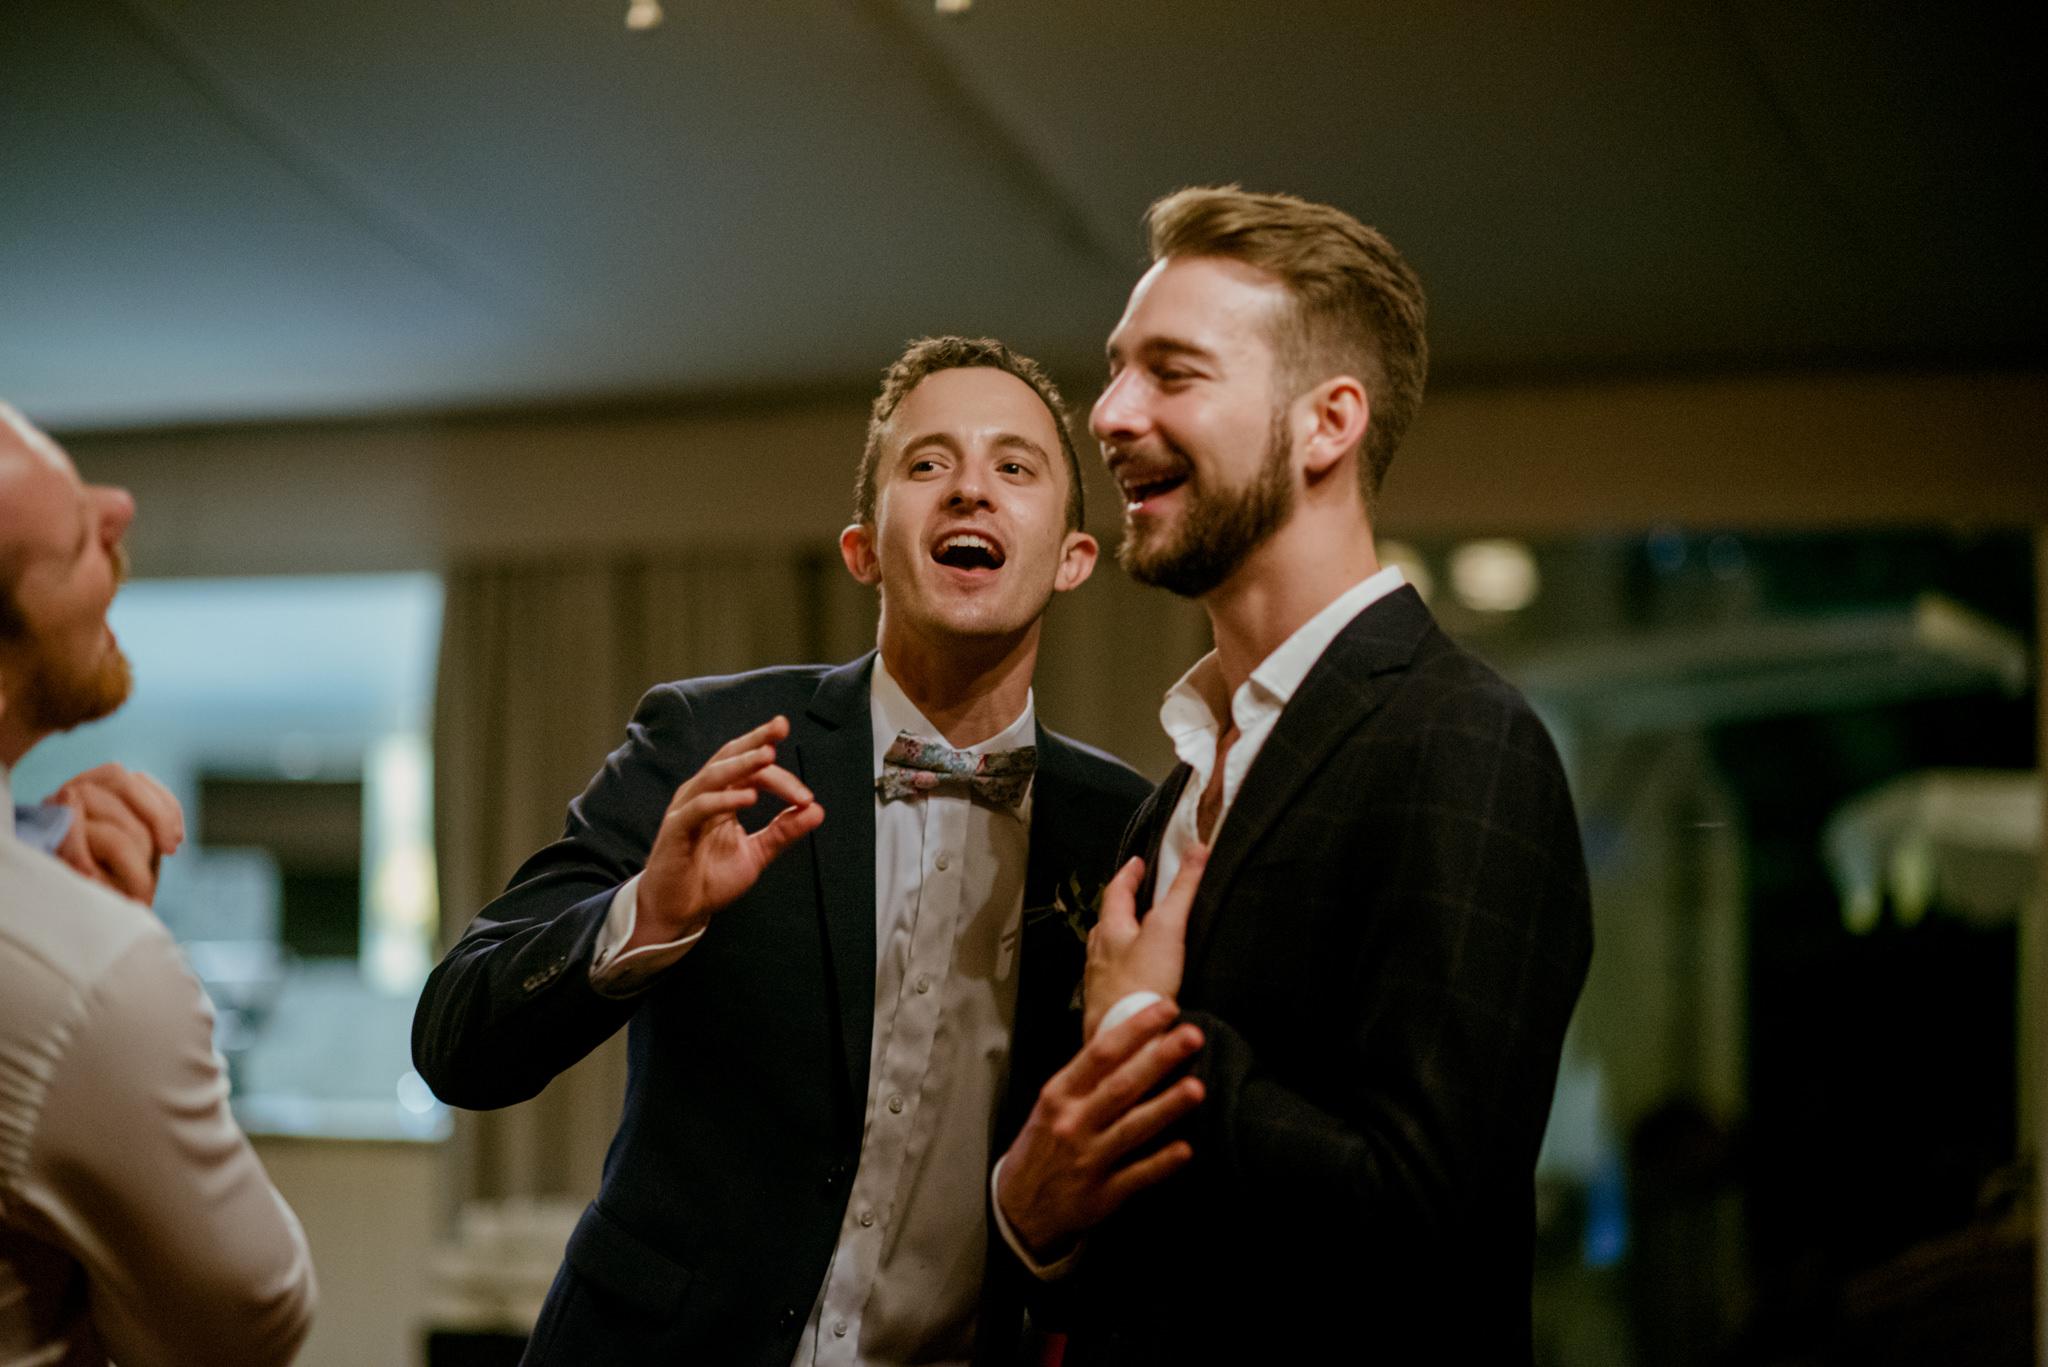 Groom and groomsman sing and dance as a wedding